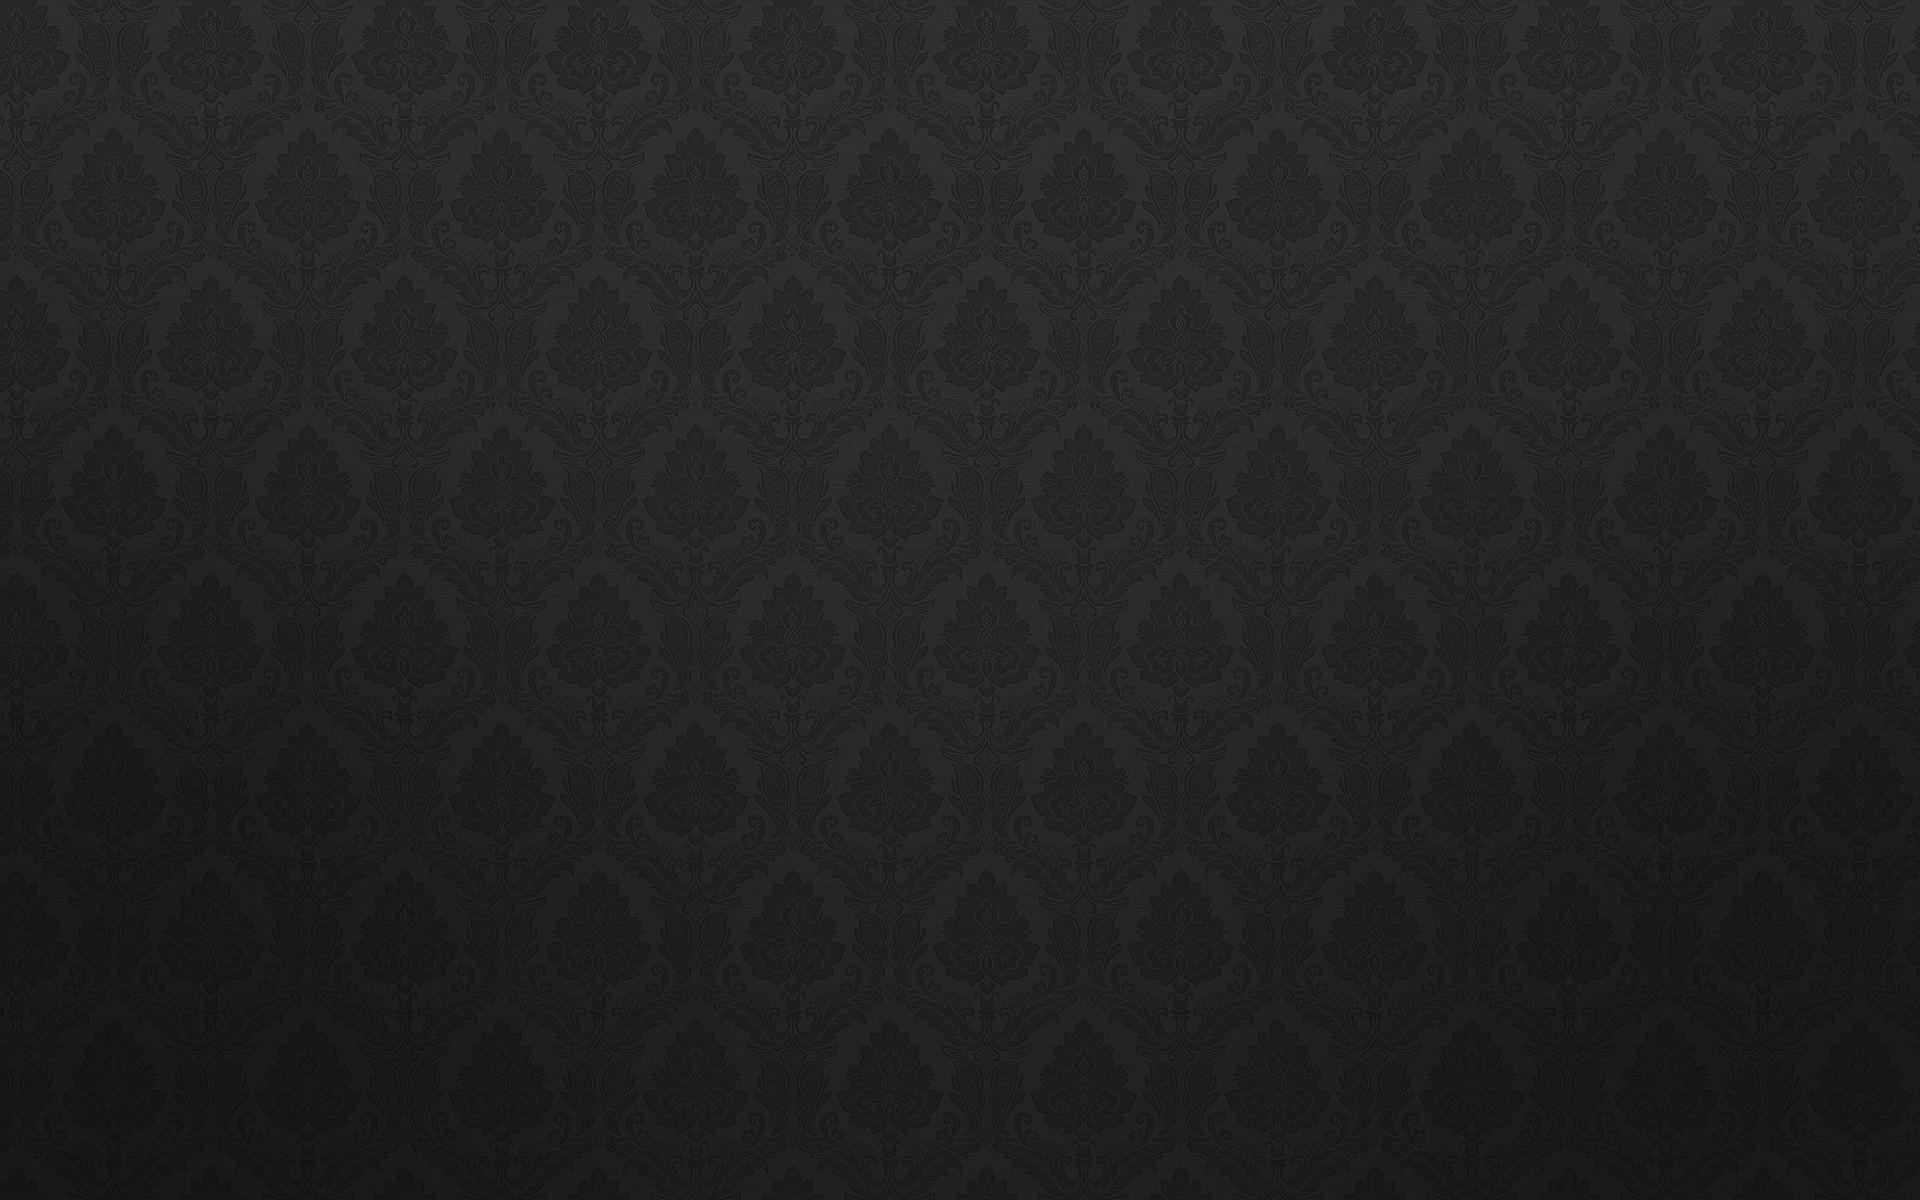 Res: 1920x1200, HD-wallpaper-Otife-Dark-black-plain-design-background.